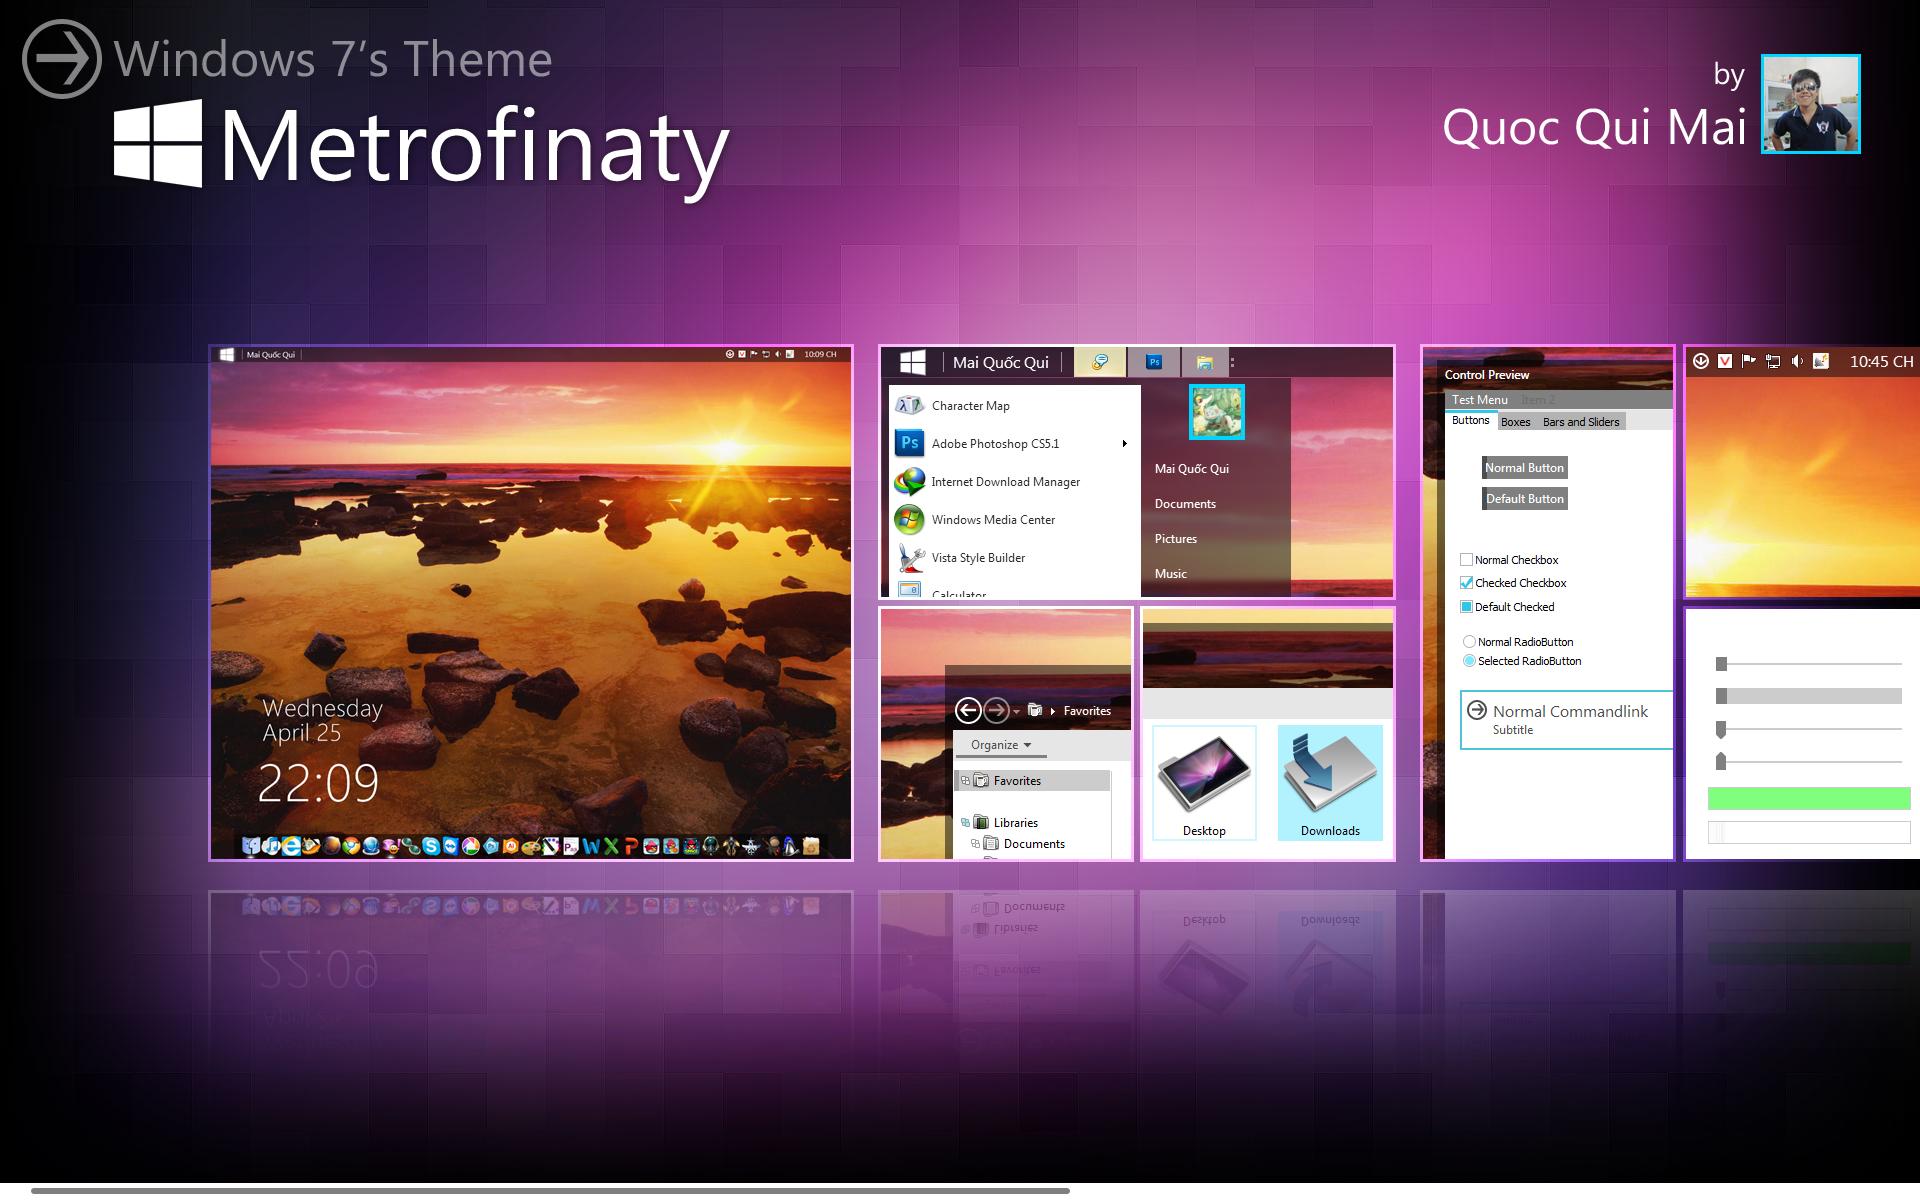 Metrofinaty for Windows 7